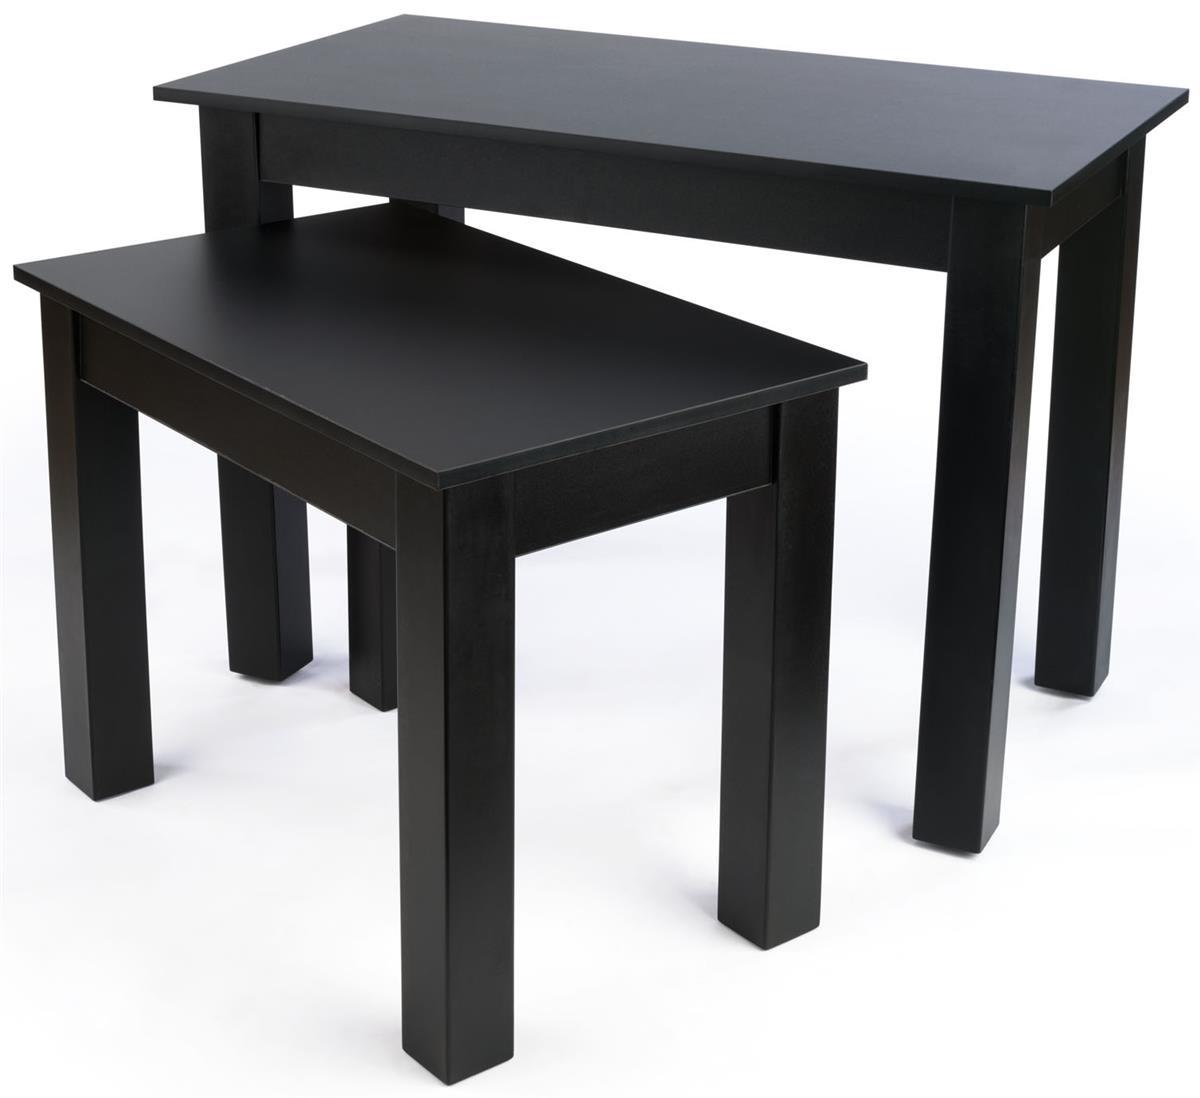 Retail nesting table black melamine finish